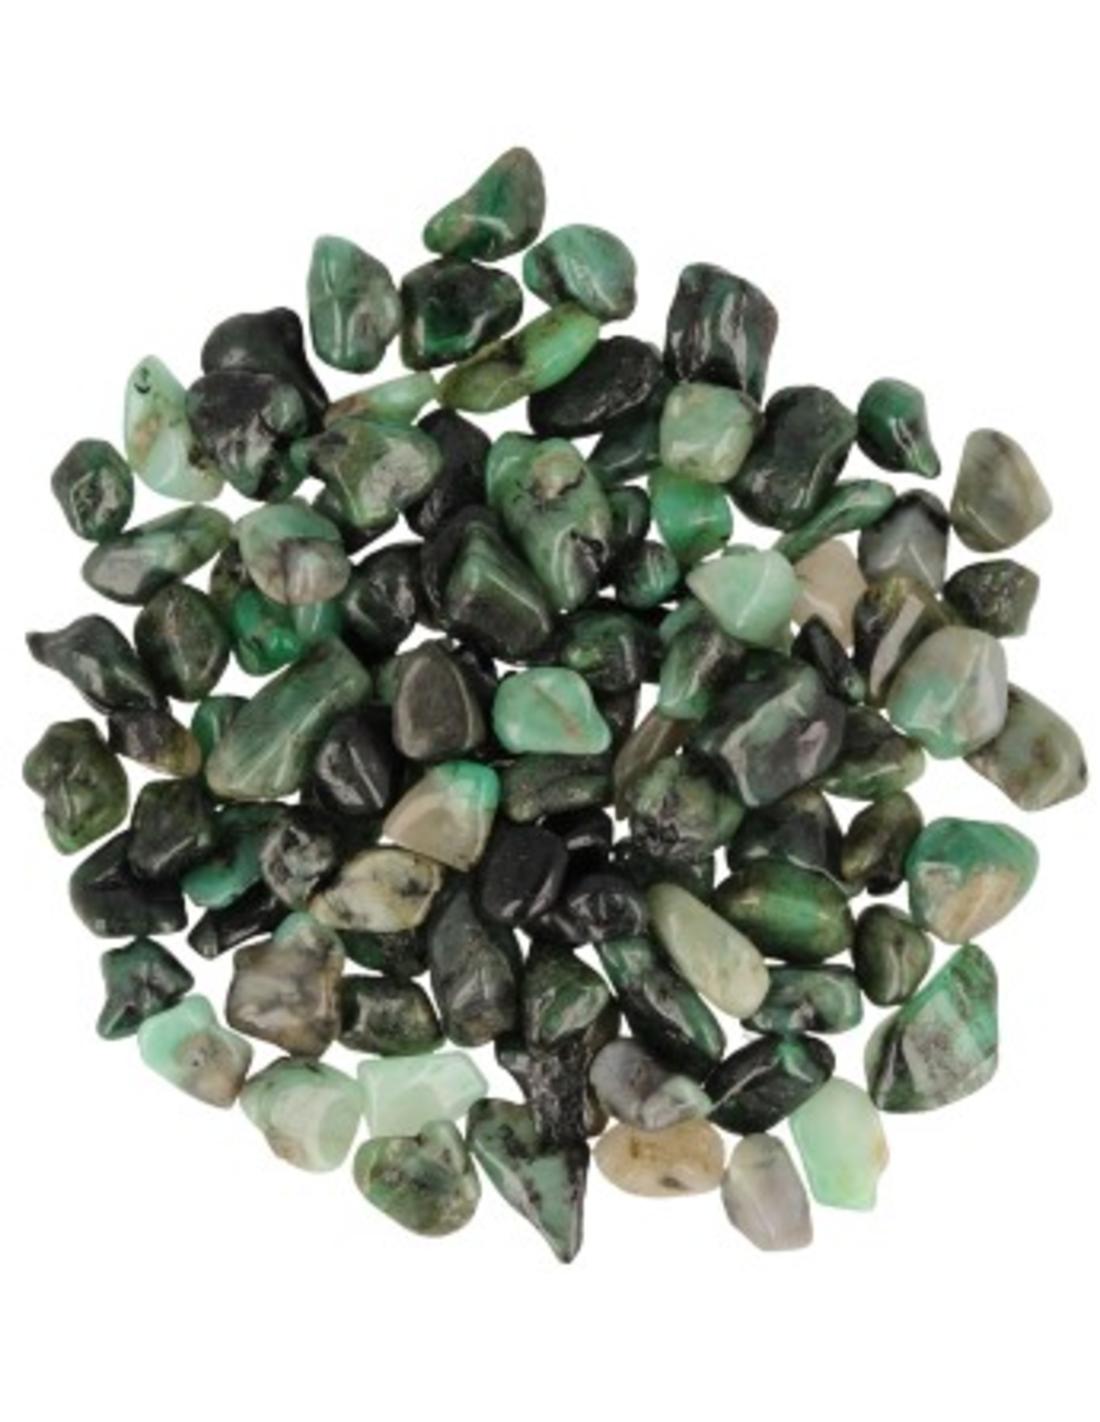 Smaragd 50 gr. trommelstenen (mt1)